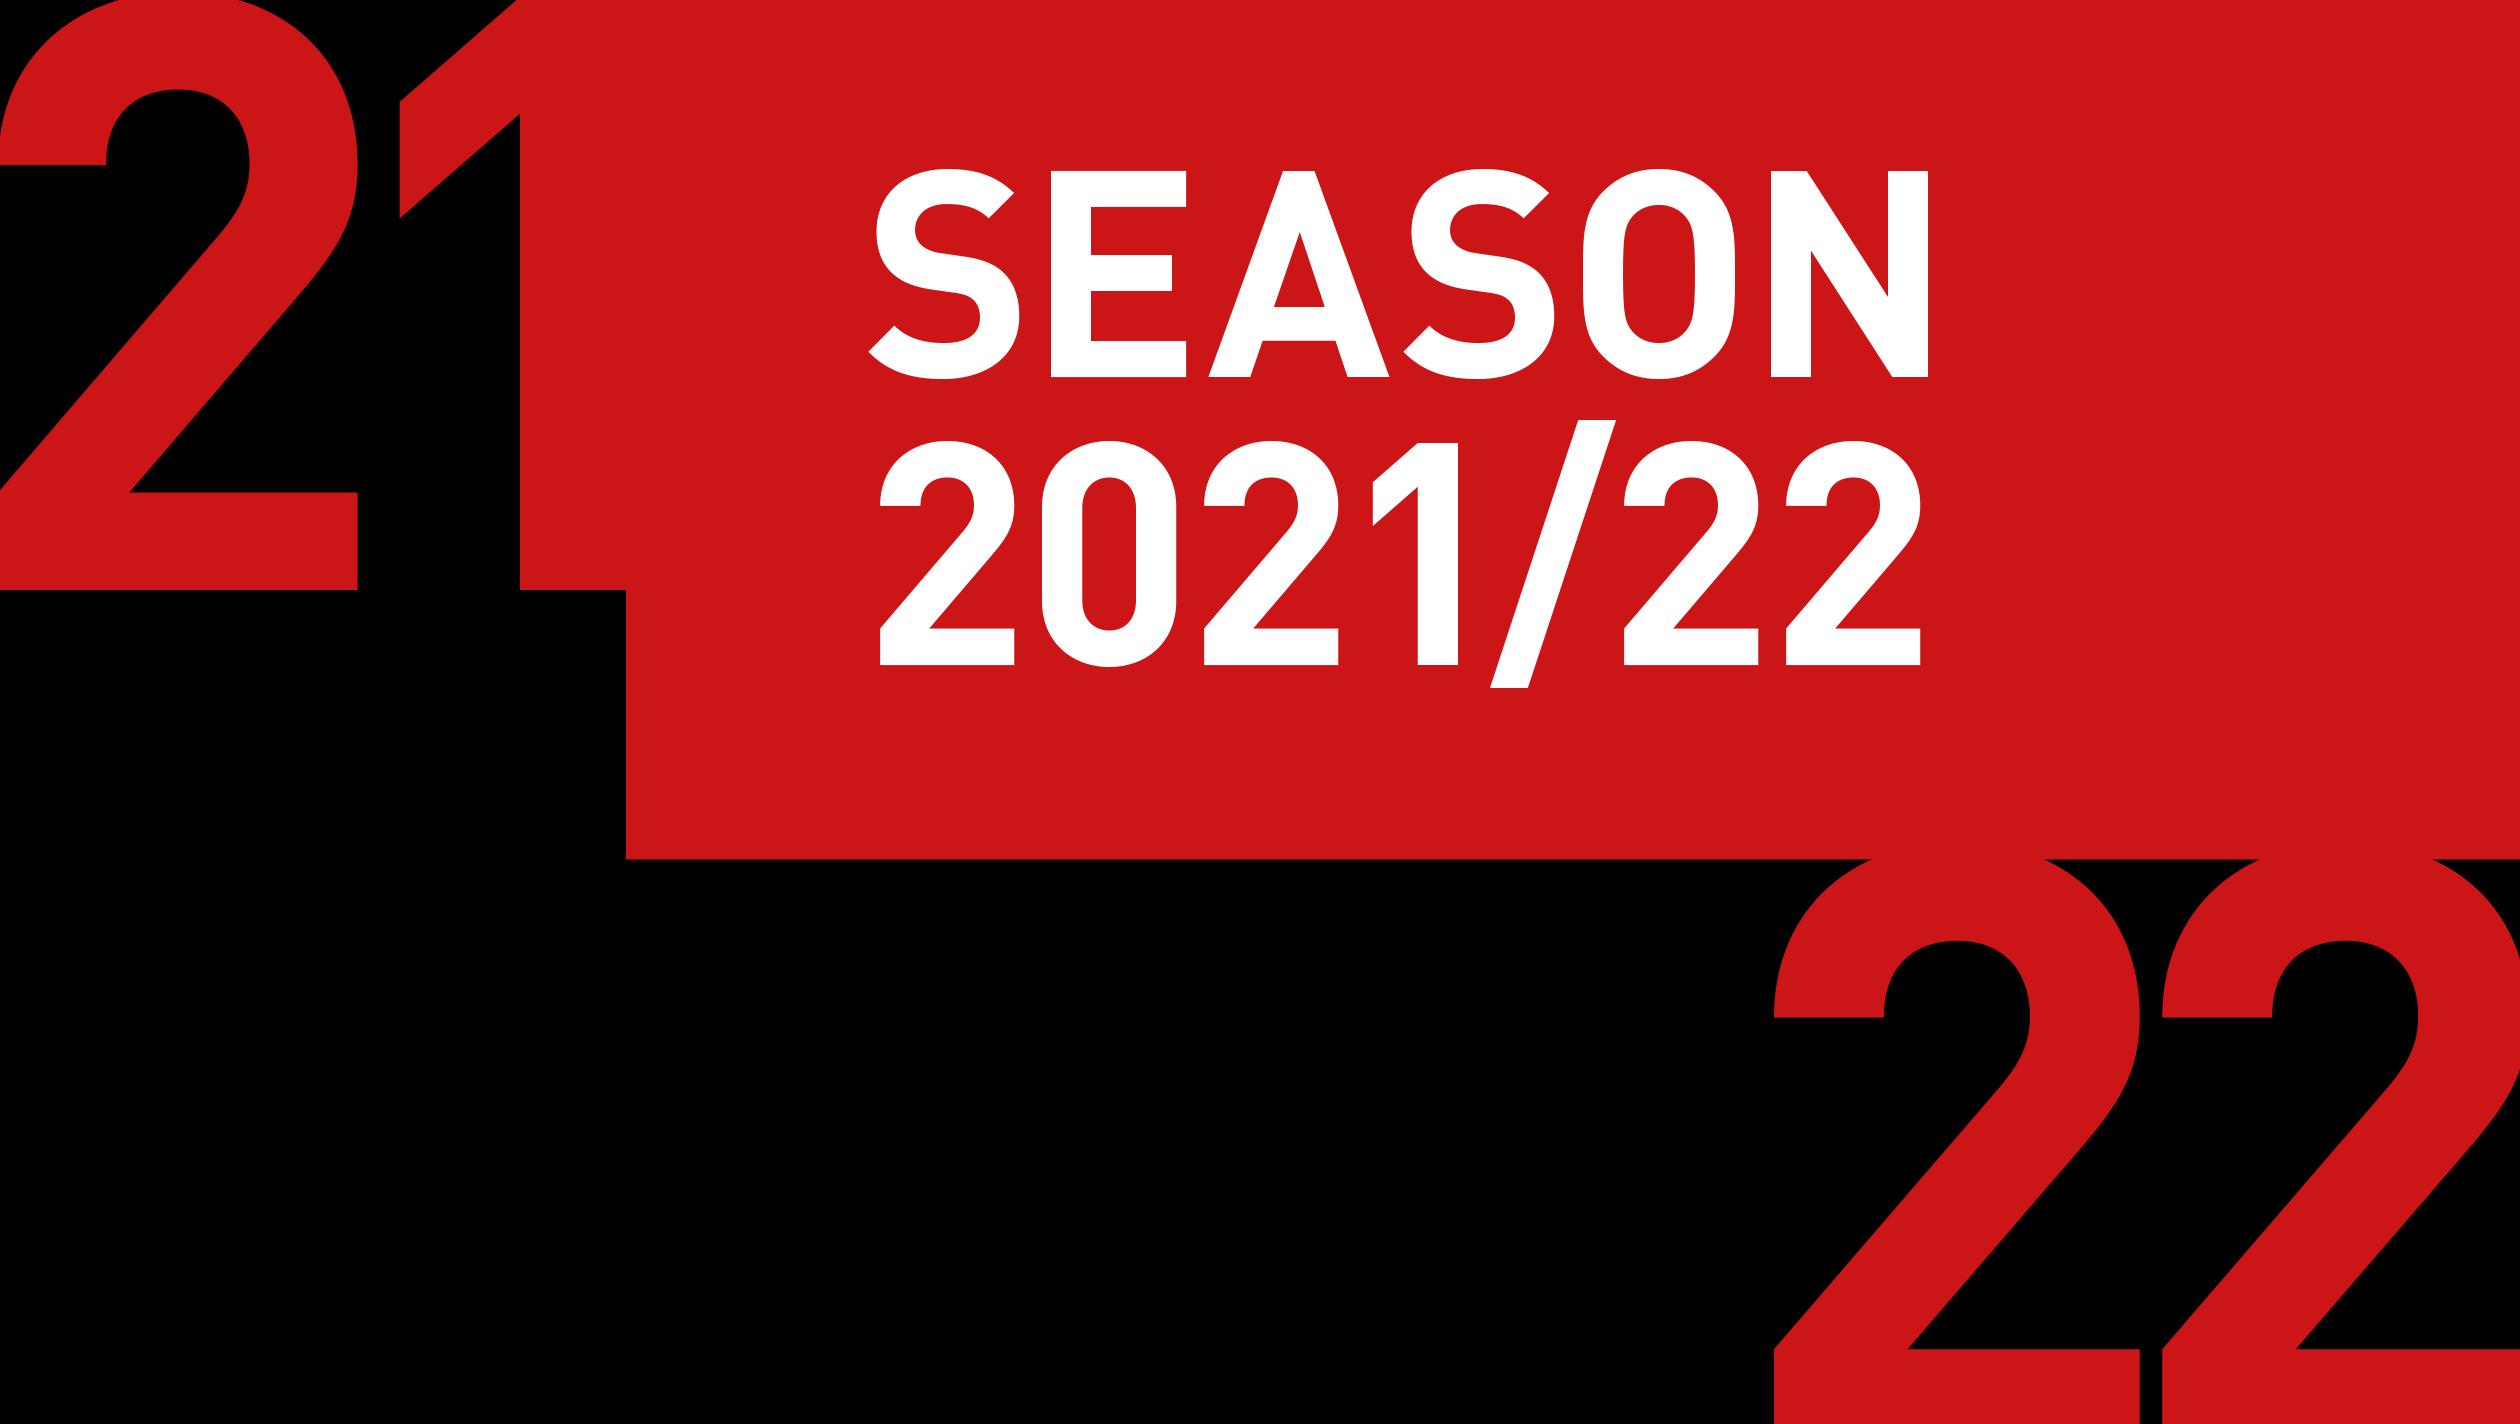 Season 2021/22